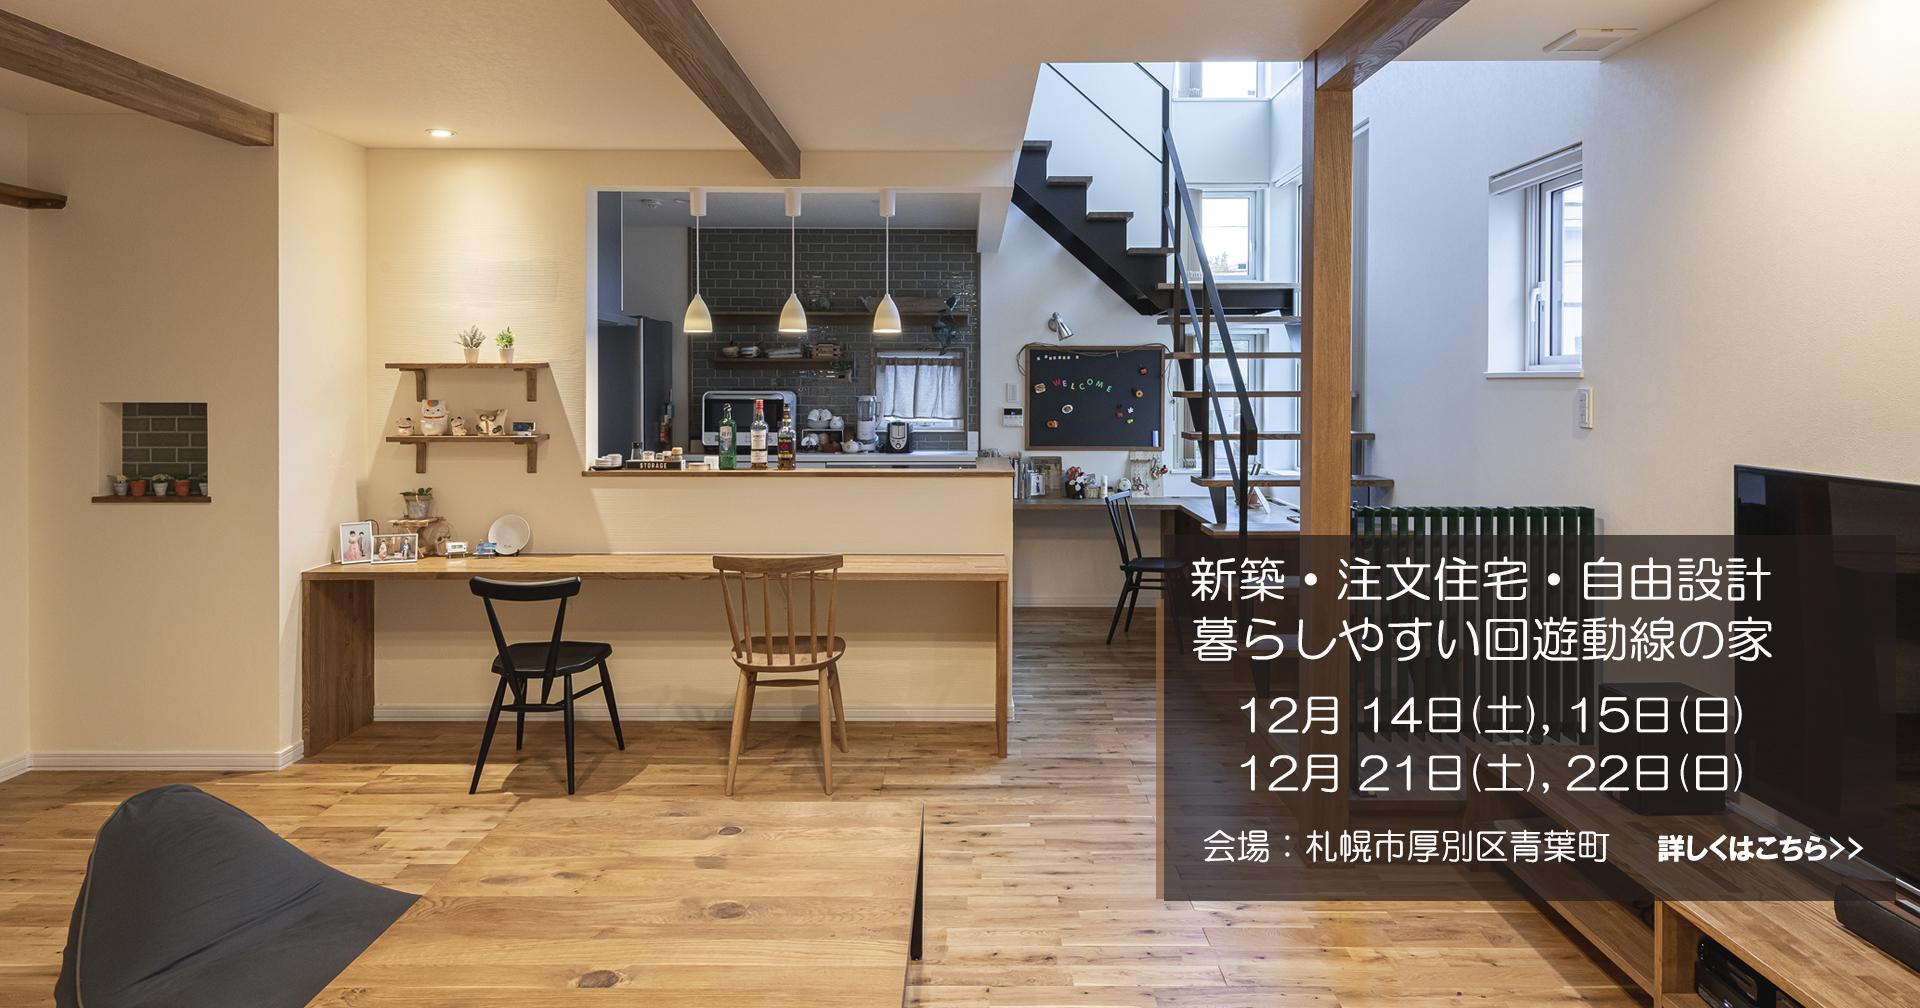 20191214~Y邸・青葉町